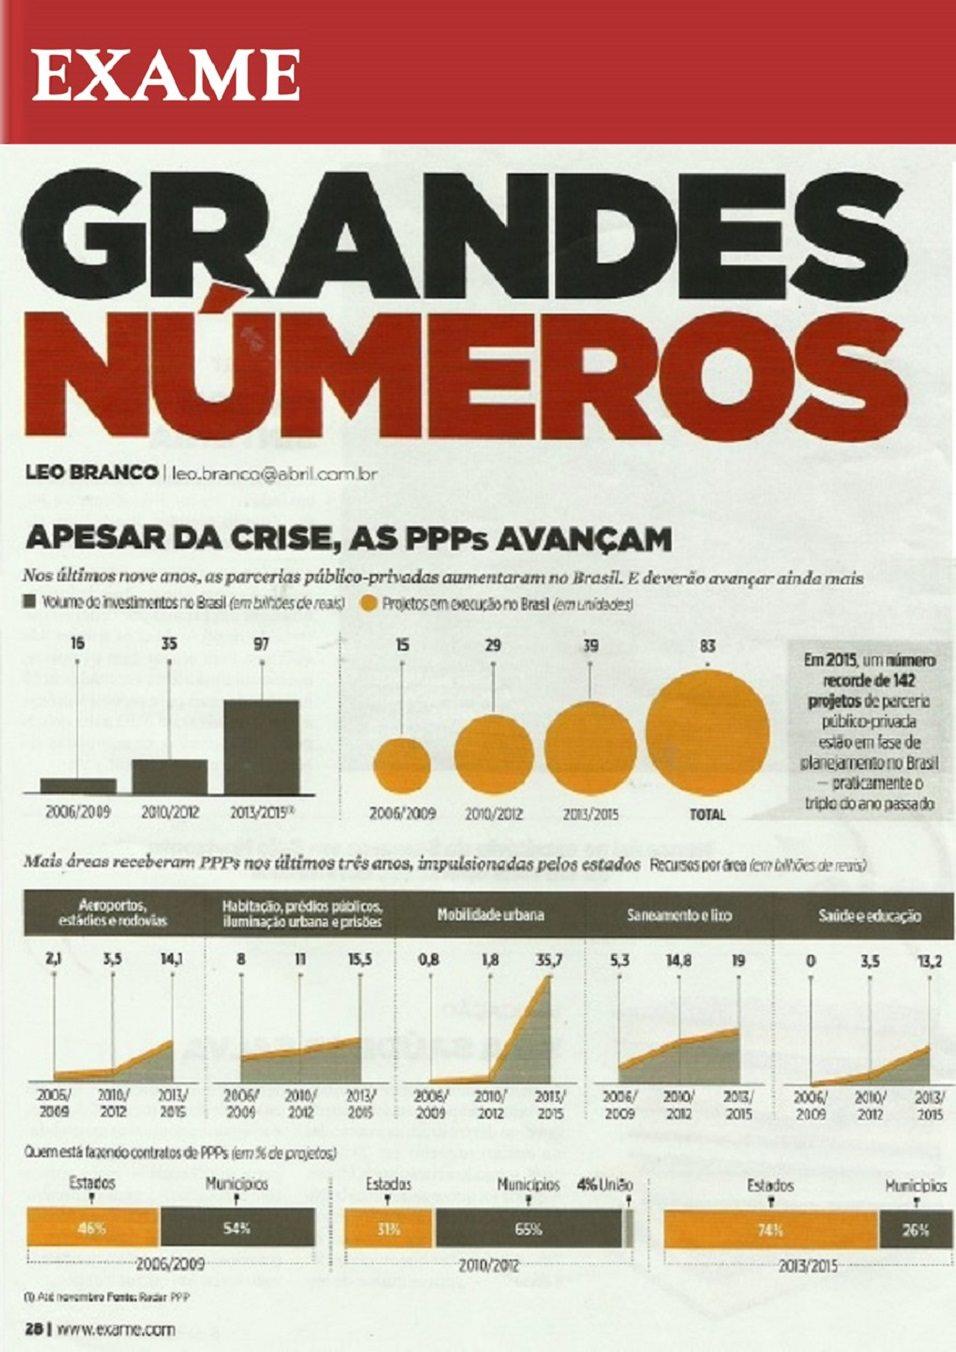 Futuro das PPPs no Brasil Revista Exame